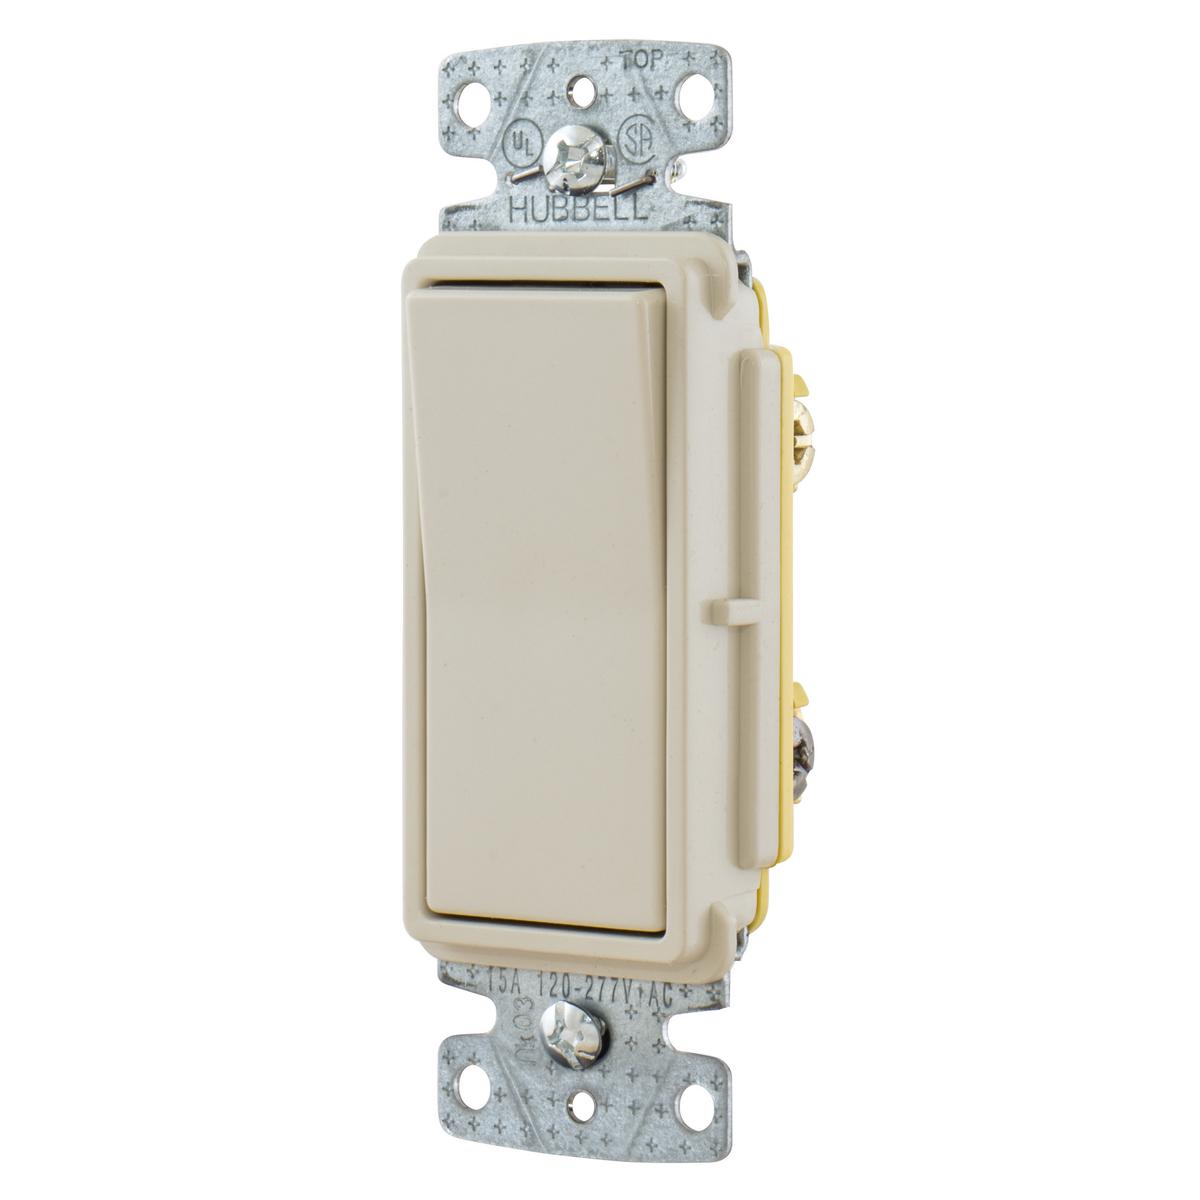 Hubbell RSD315LA 15 Amp 120/277 VAC 3-Way Light Almond Rocker Switch